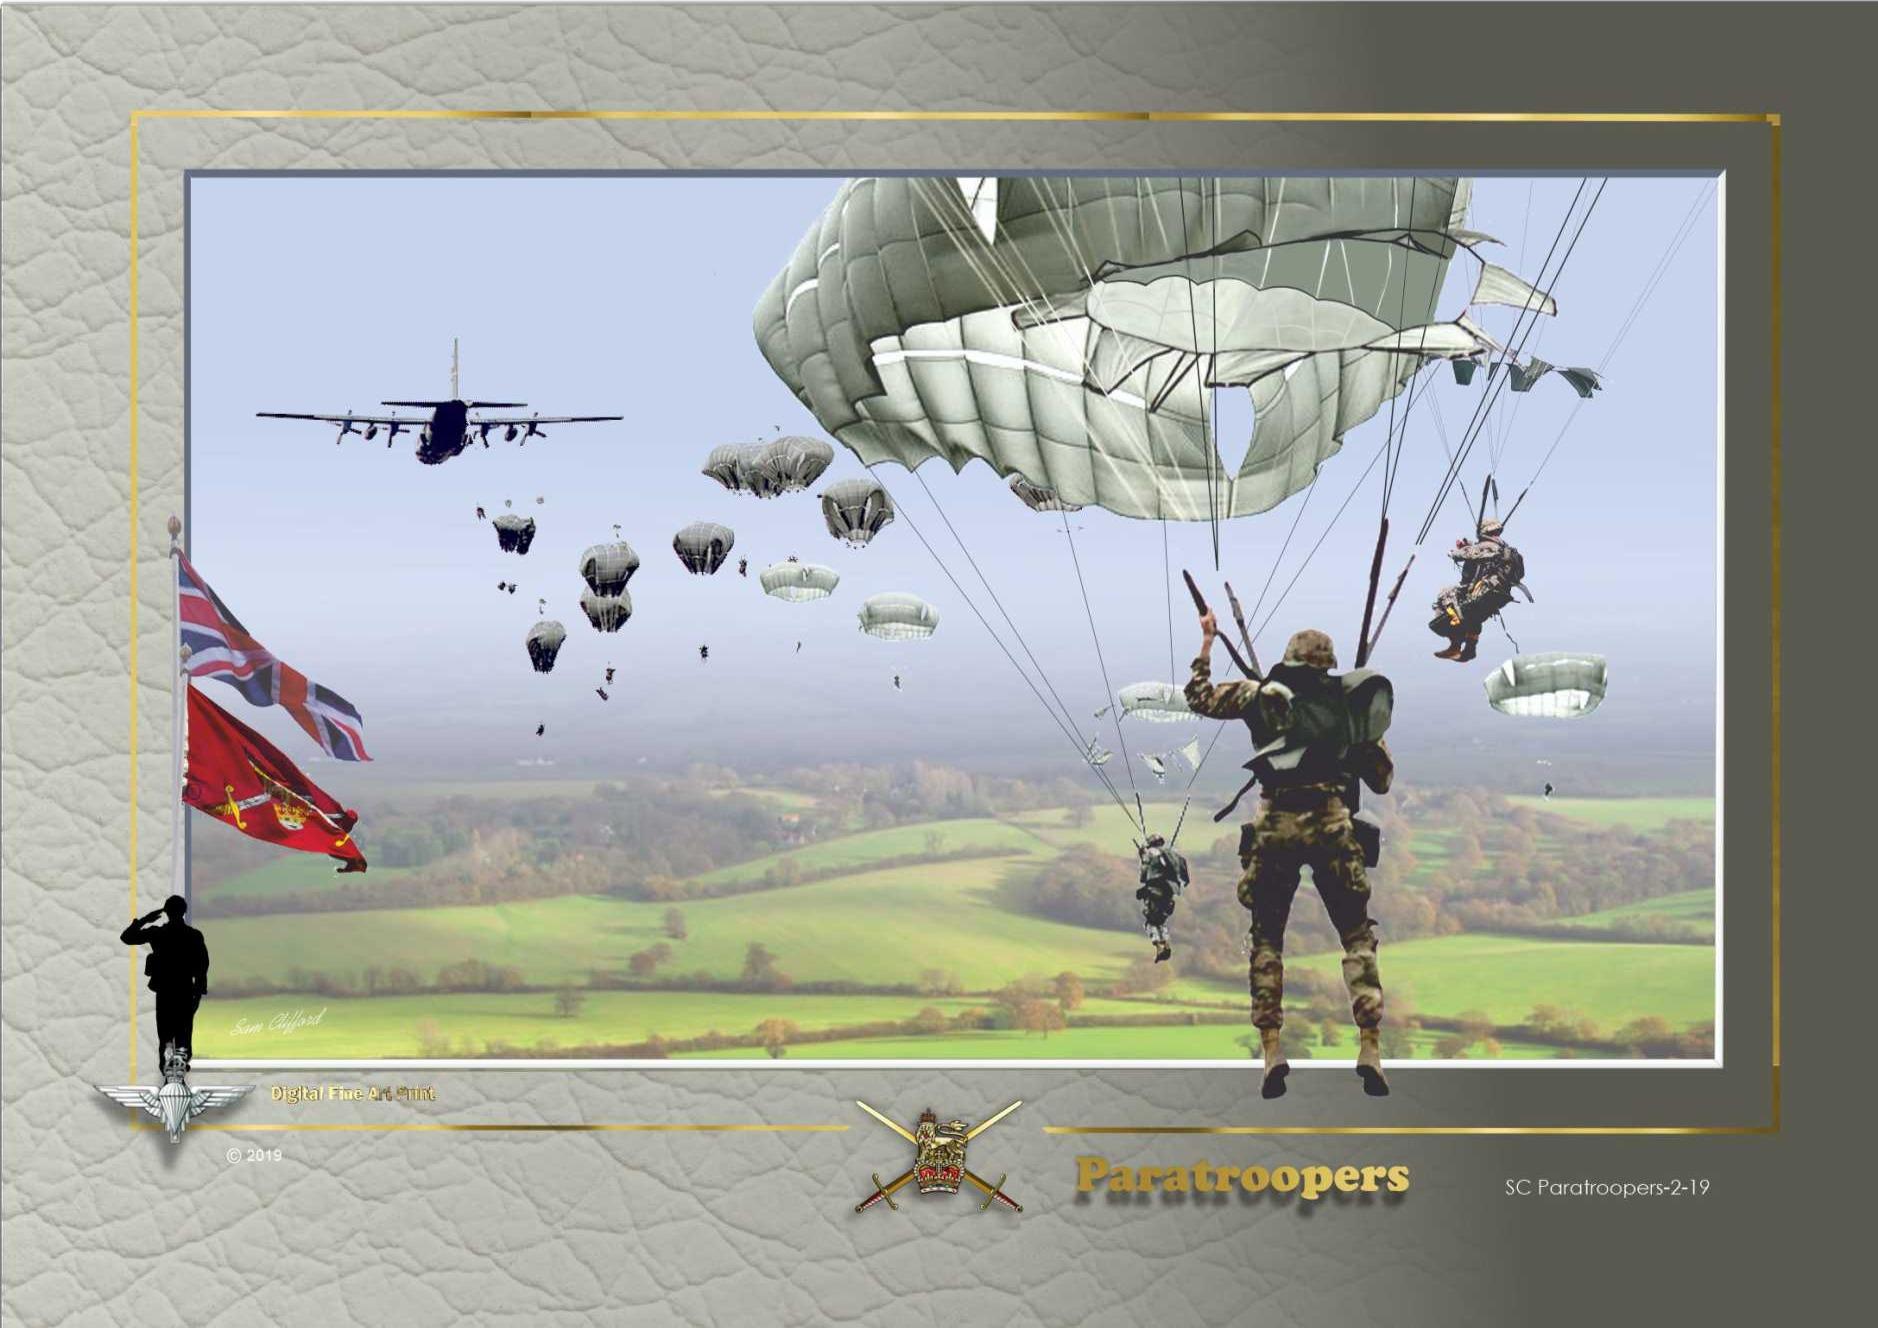 print code SC Paratroopers-19